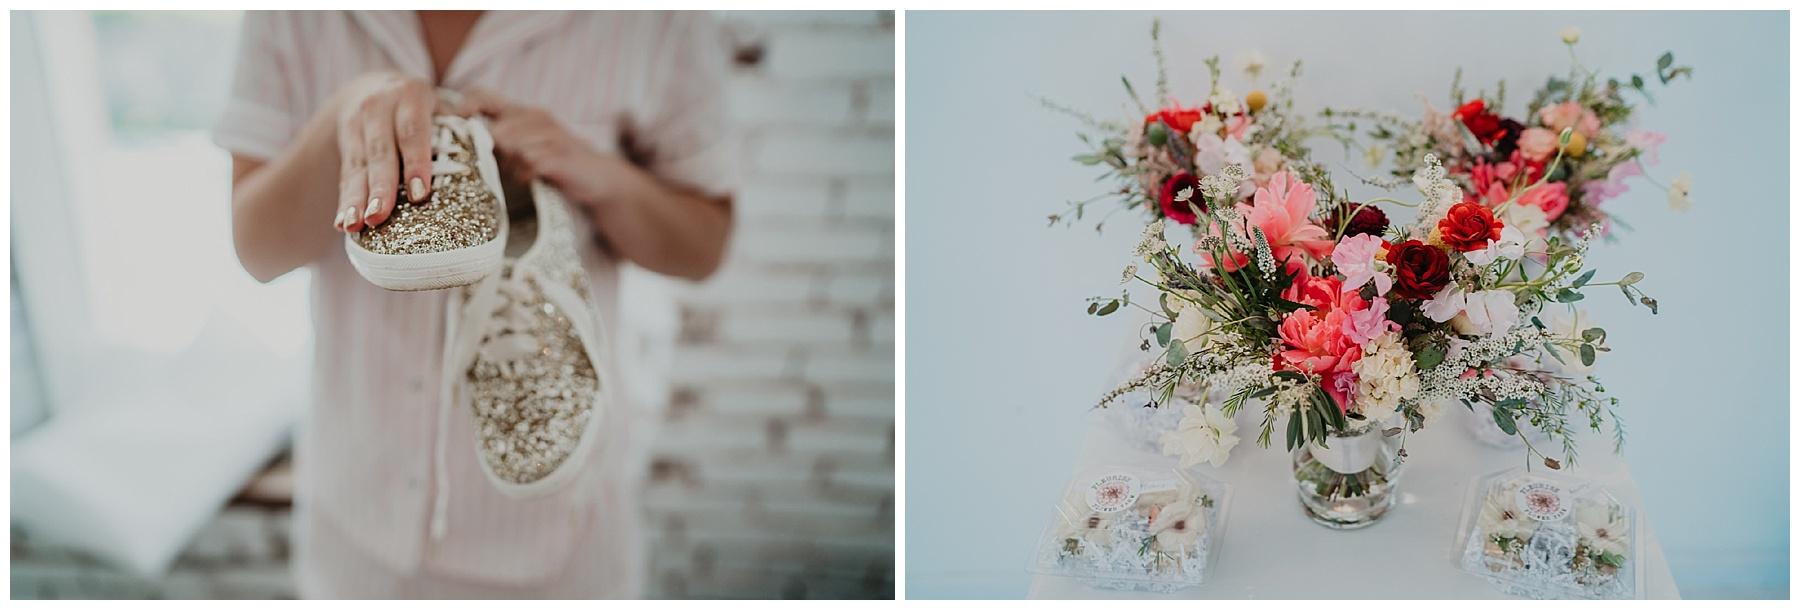 the_ravington_wedding_arkansas_0004.jpg